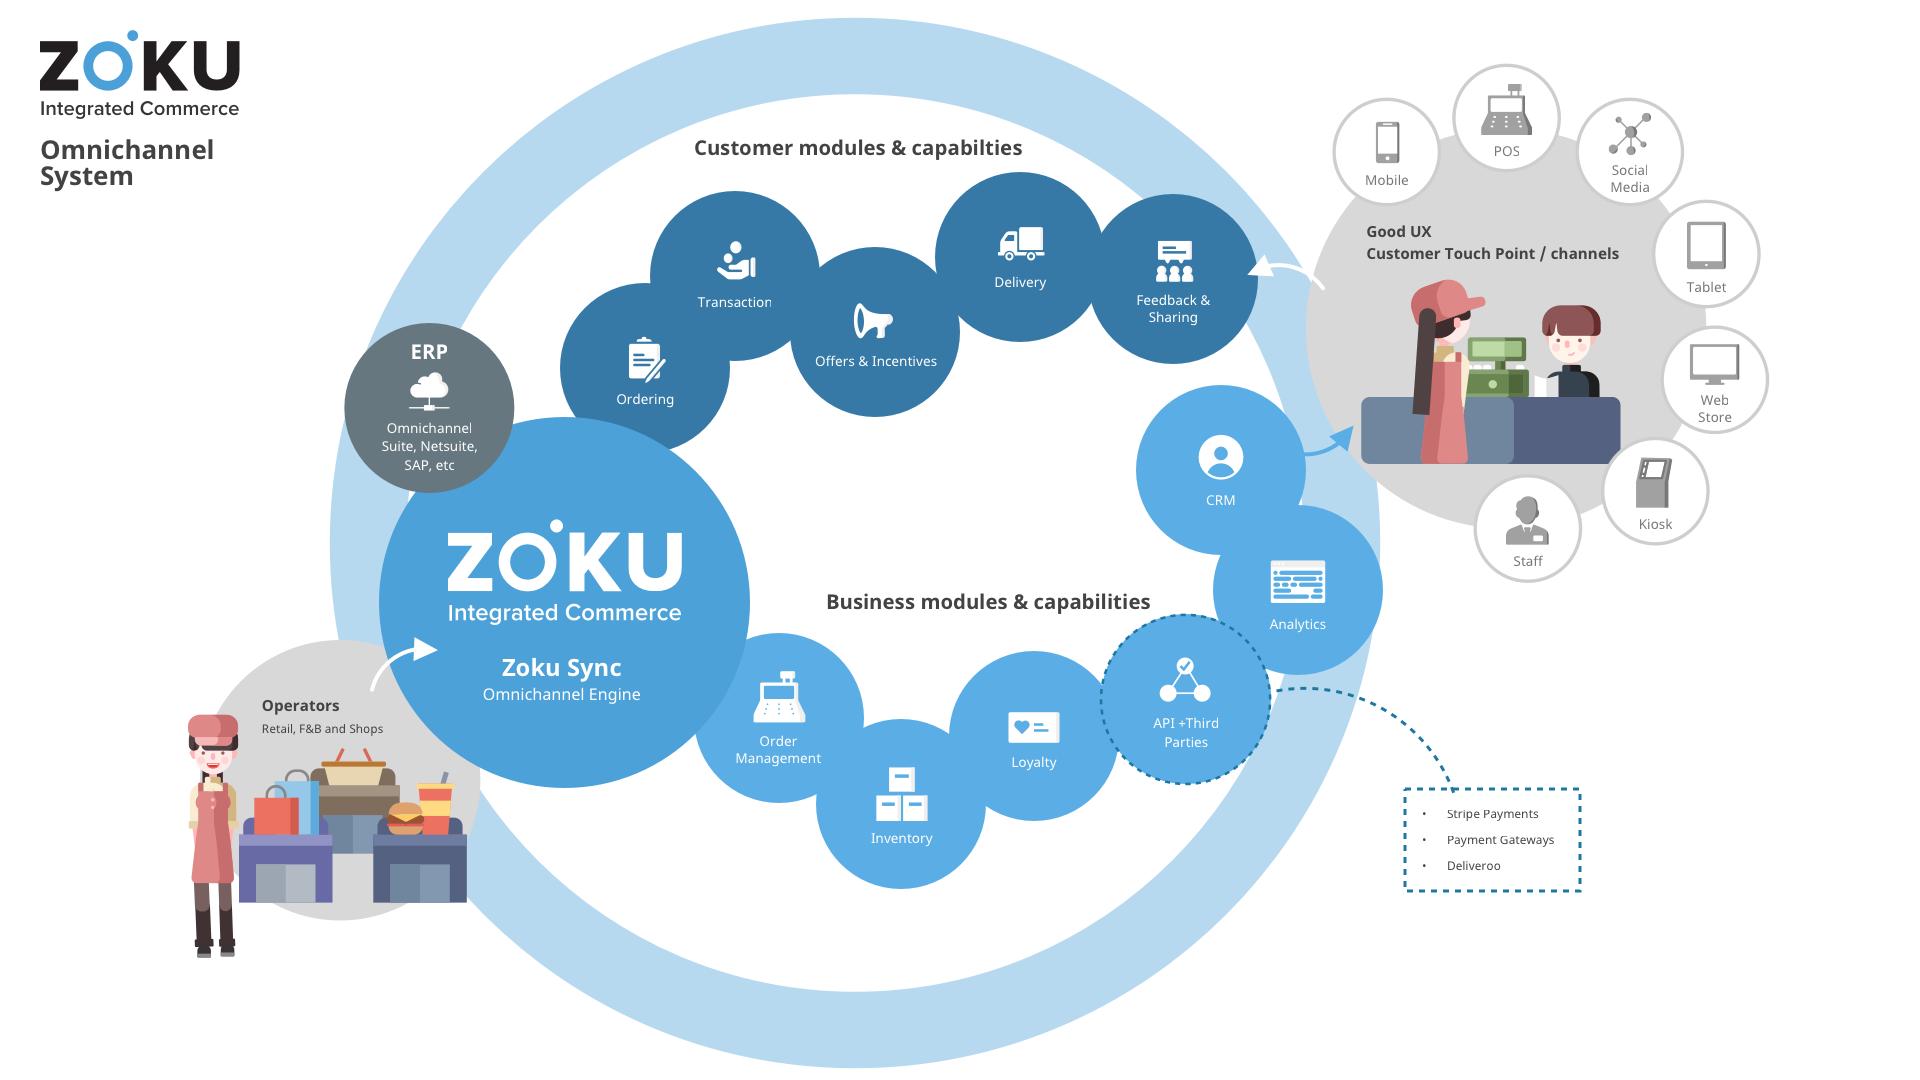 About — ZOKU